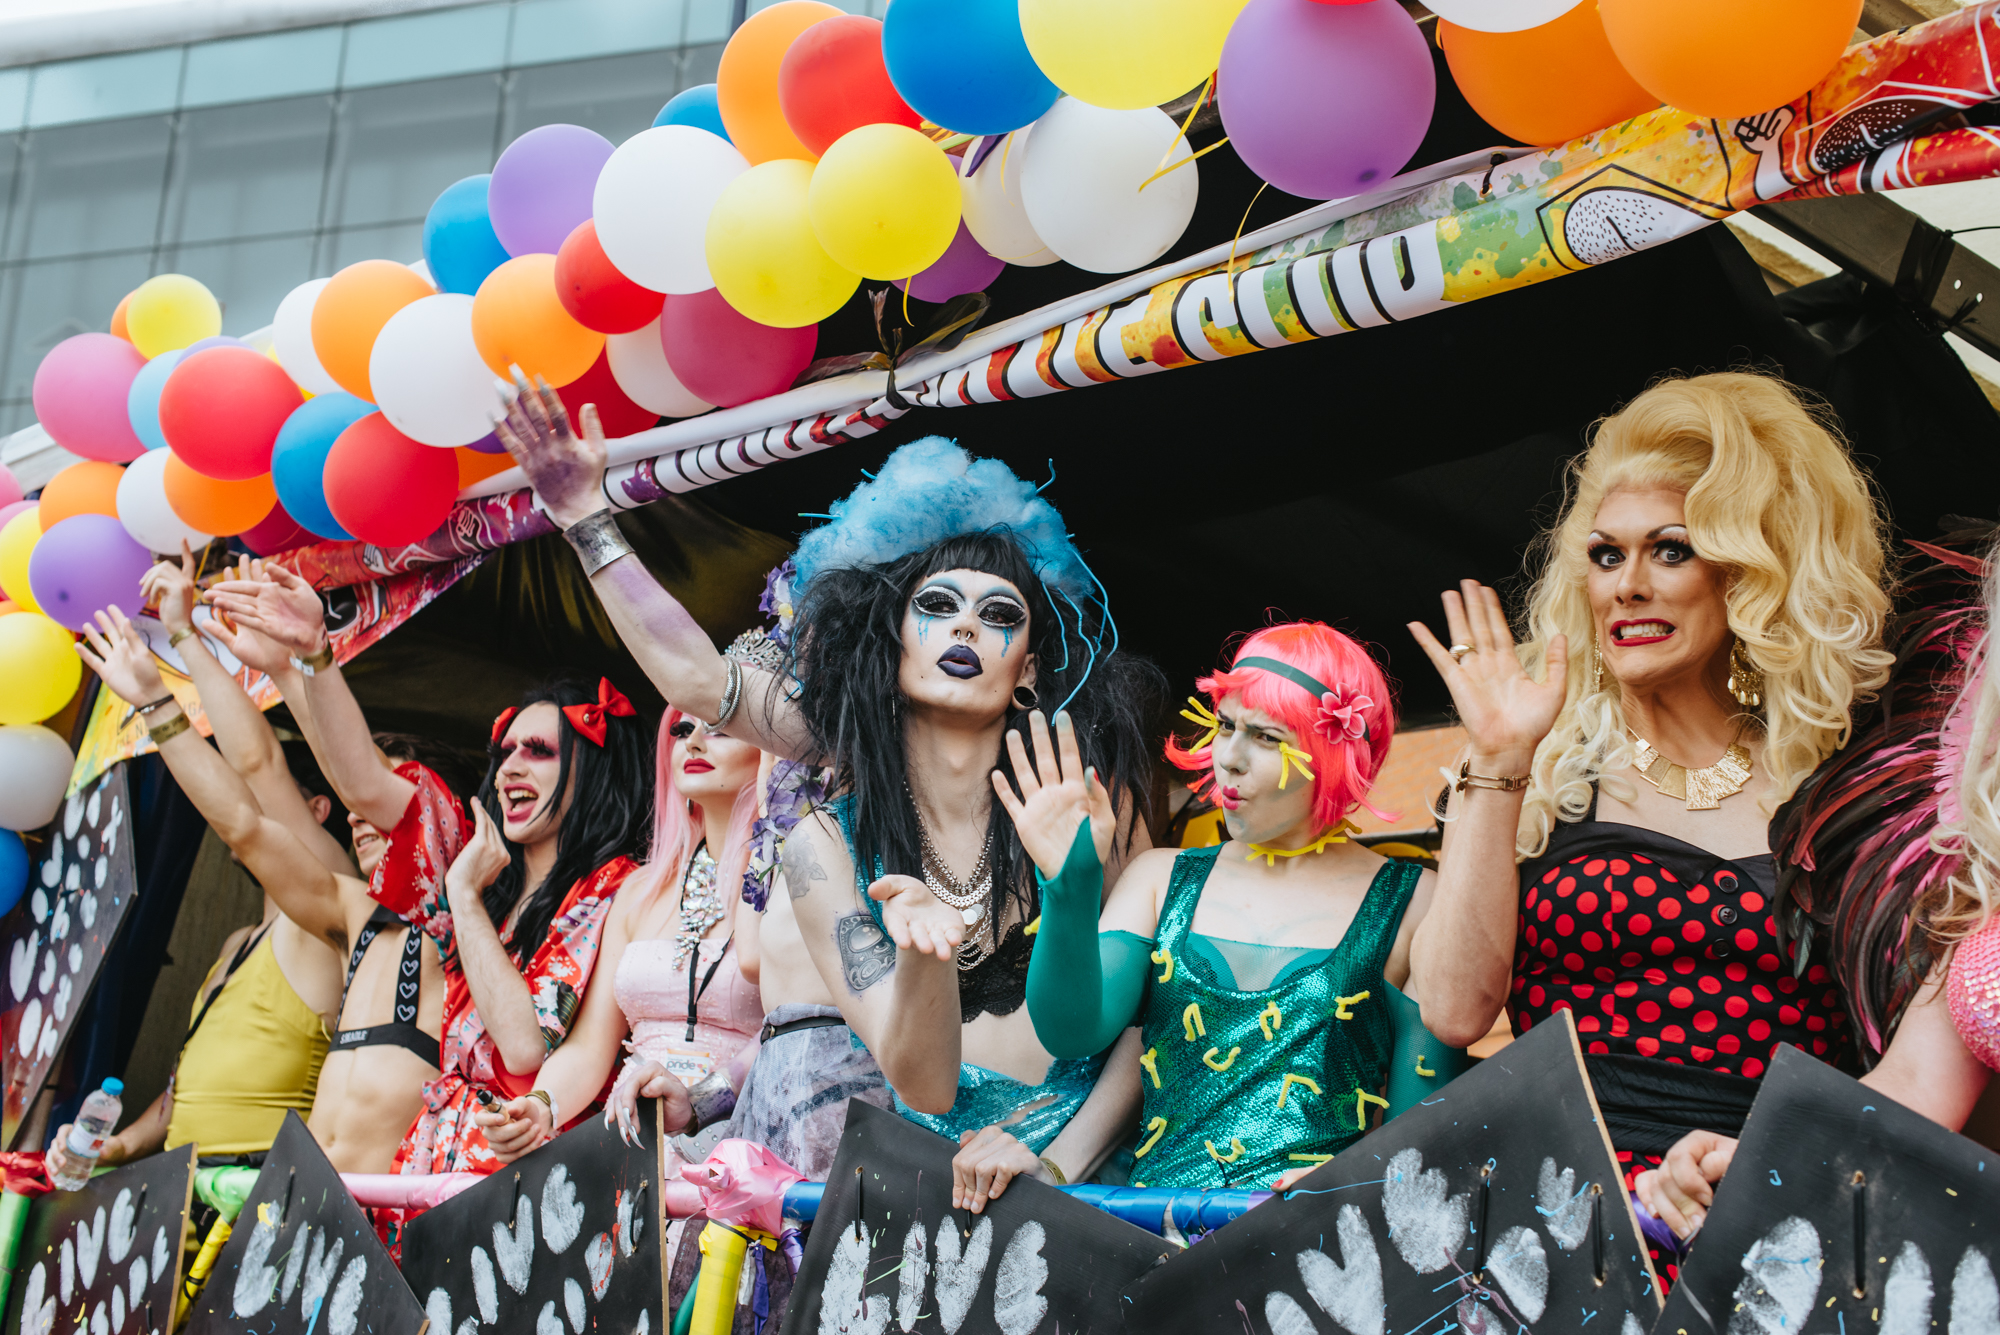 Birmingham-Pride-Parade-20170527-0846-Hanny-Foxhall.jpg